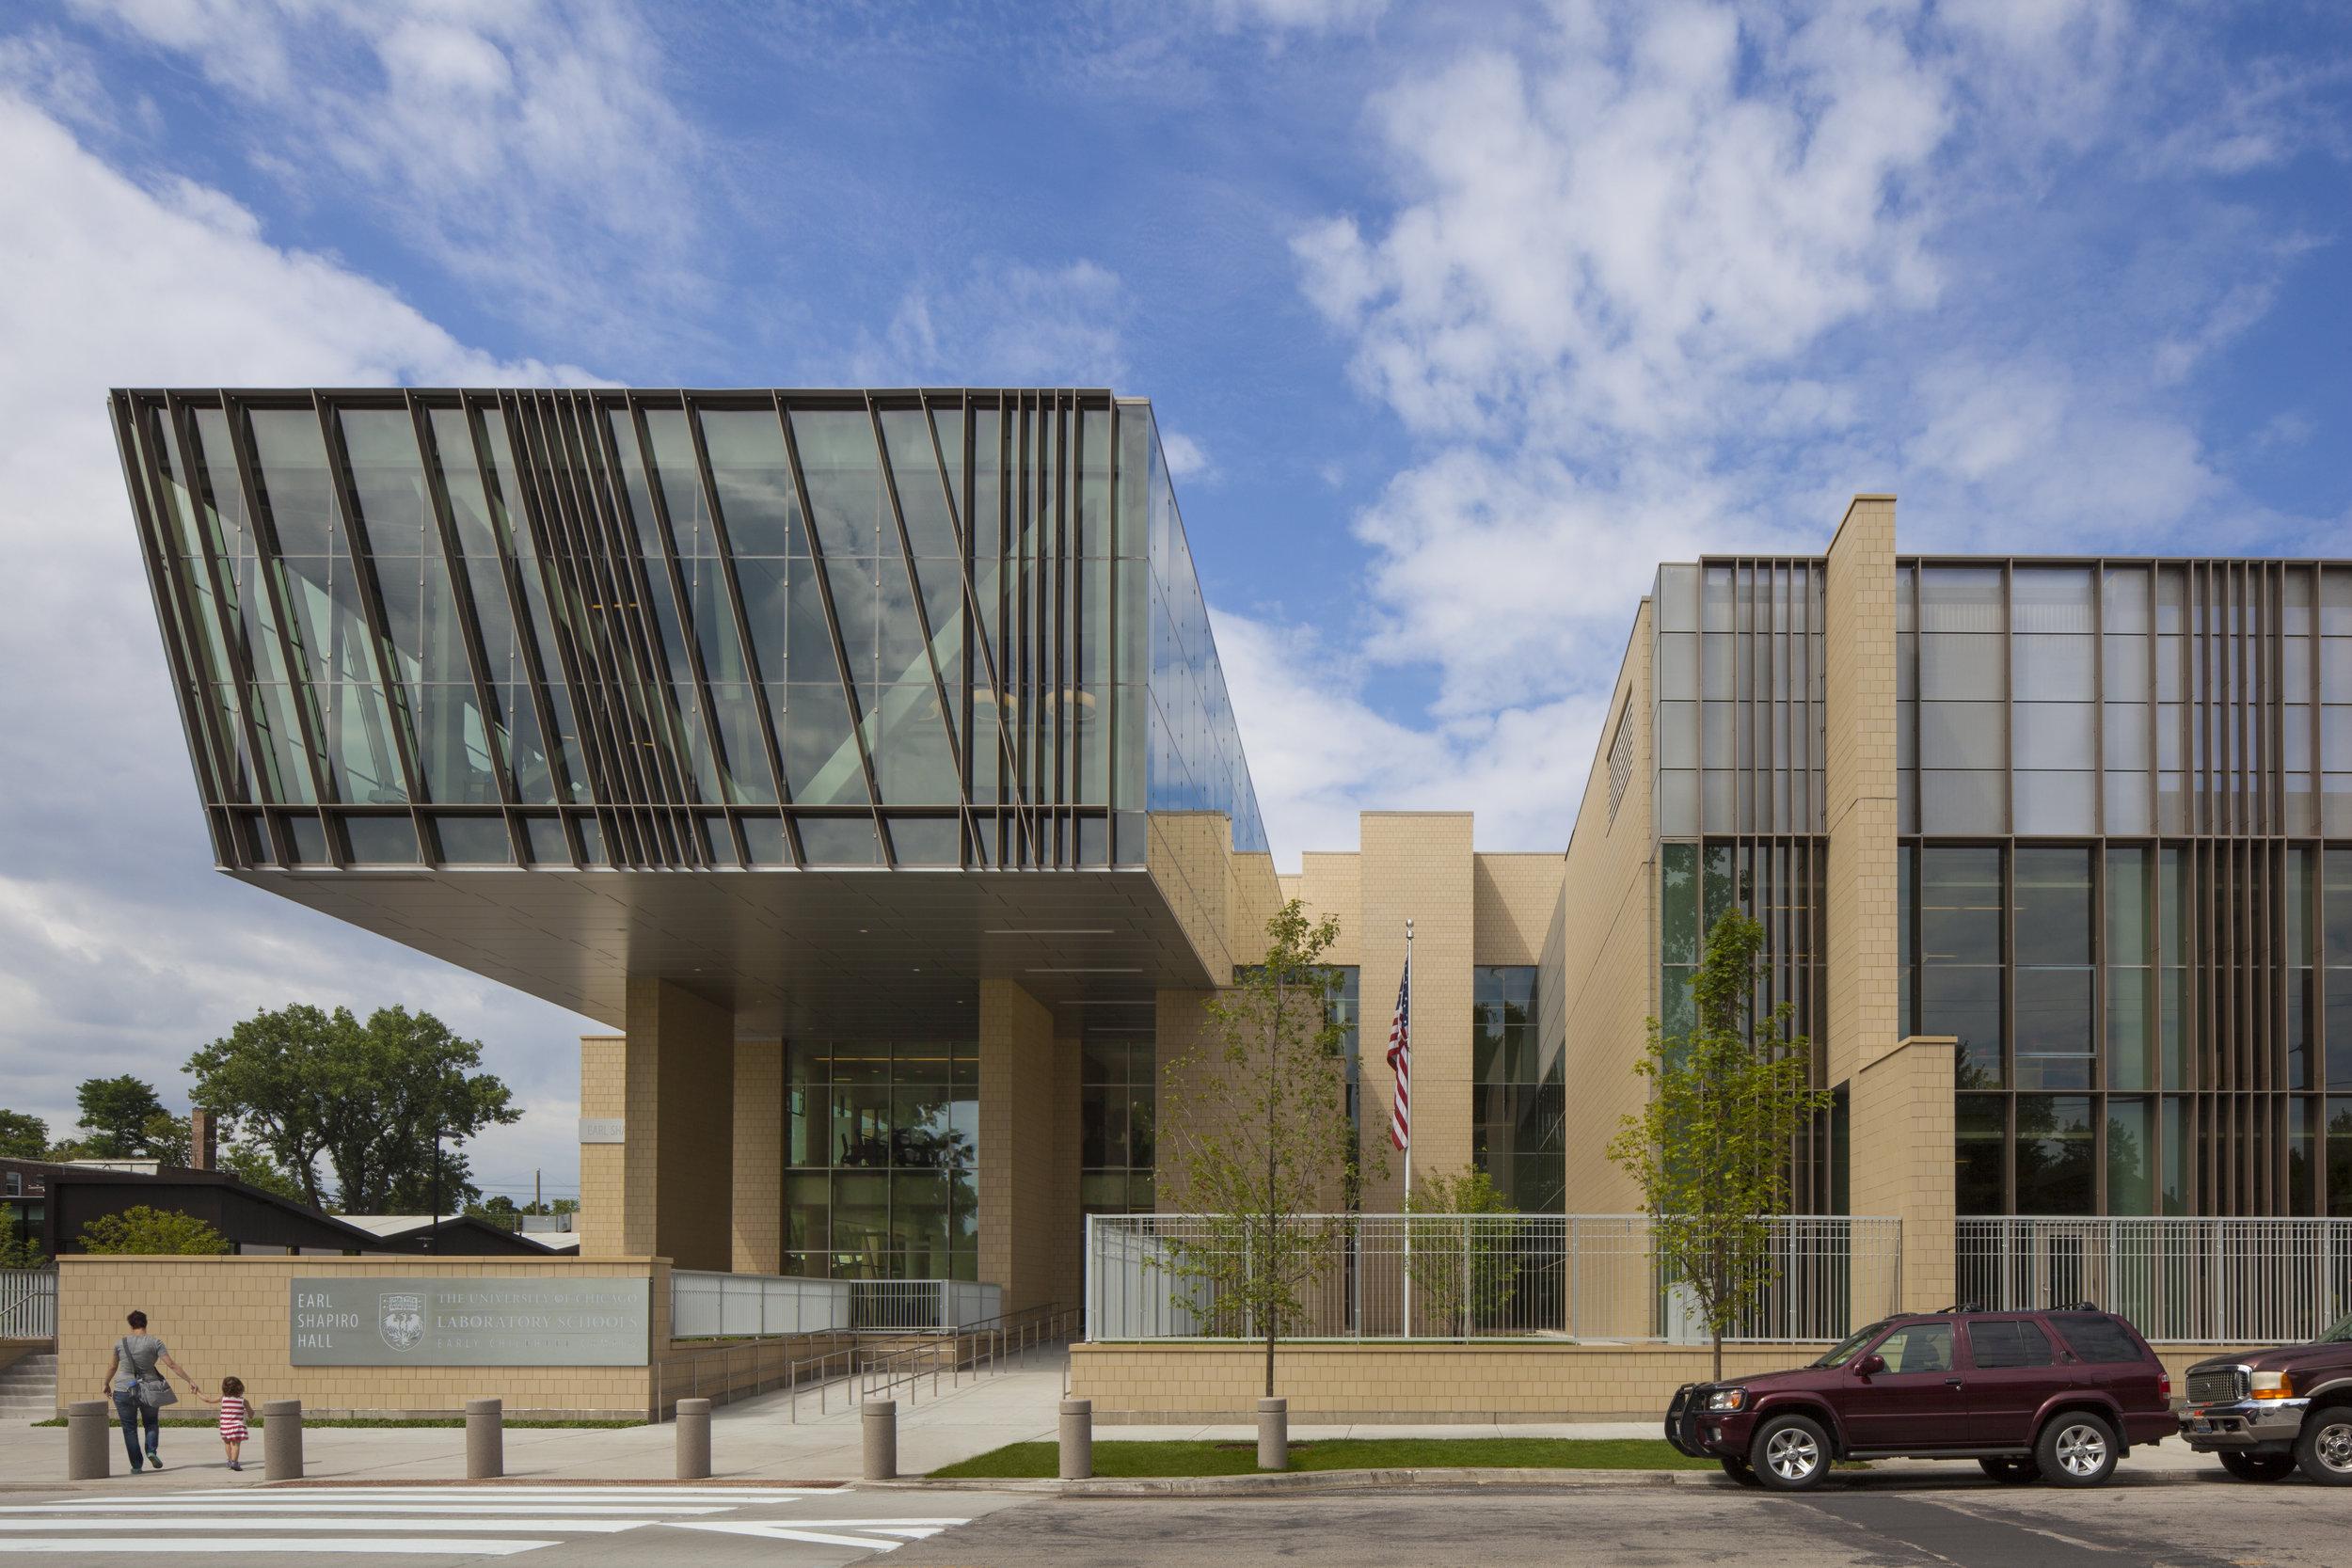 University of Chicago Lab Schools: Earl Shapiro Hall